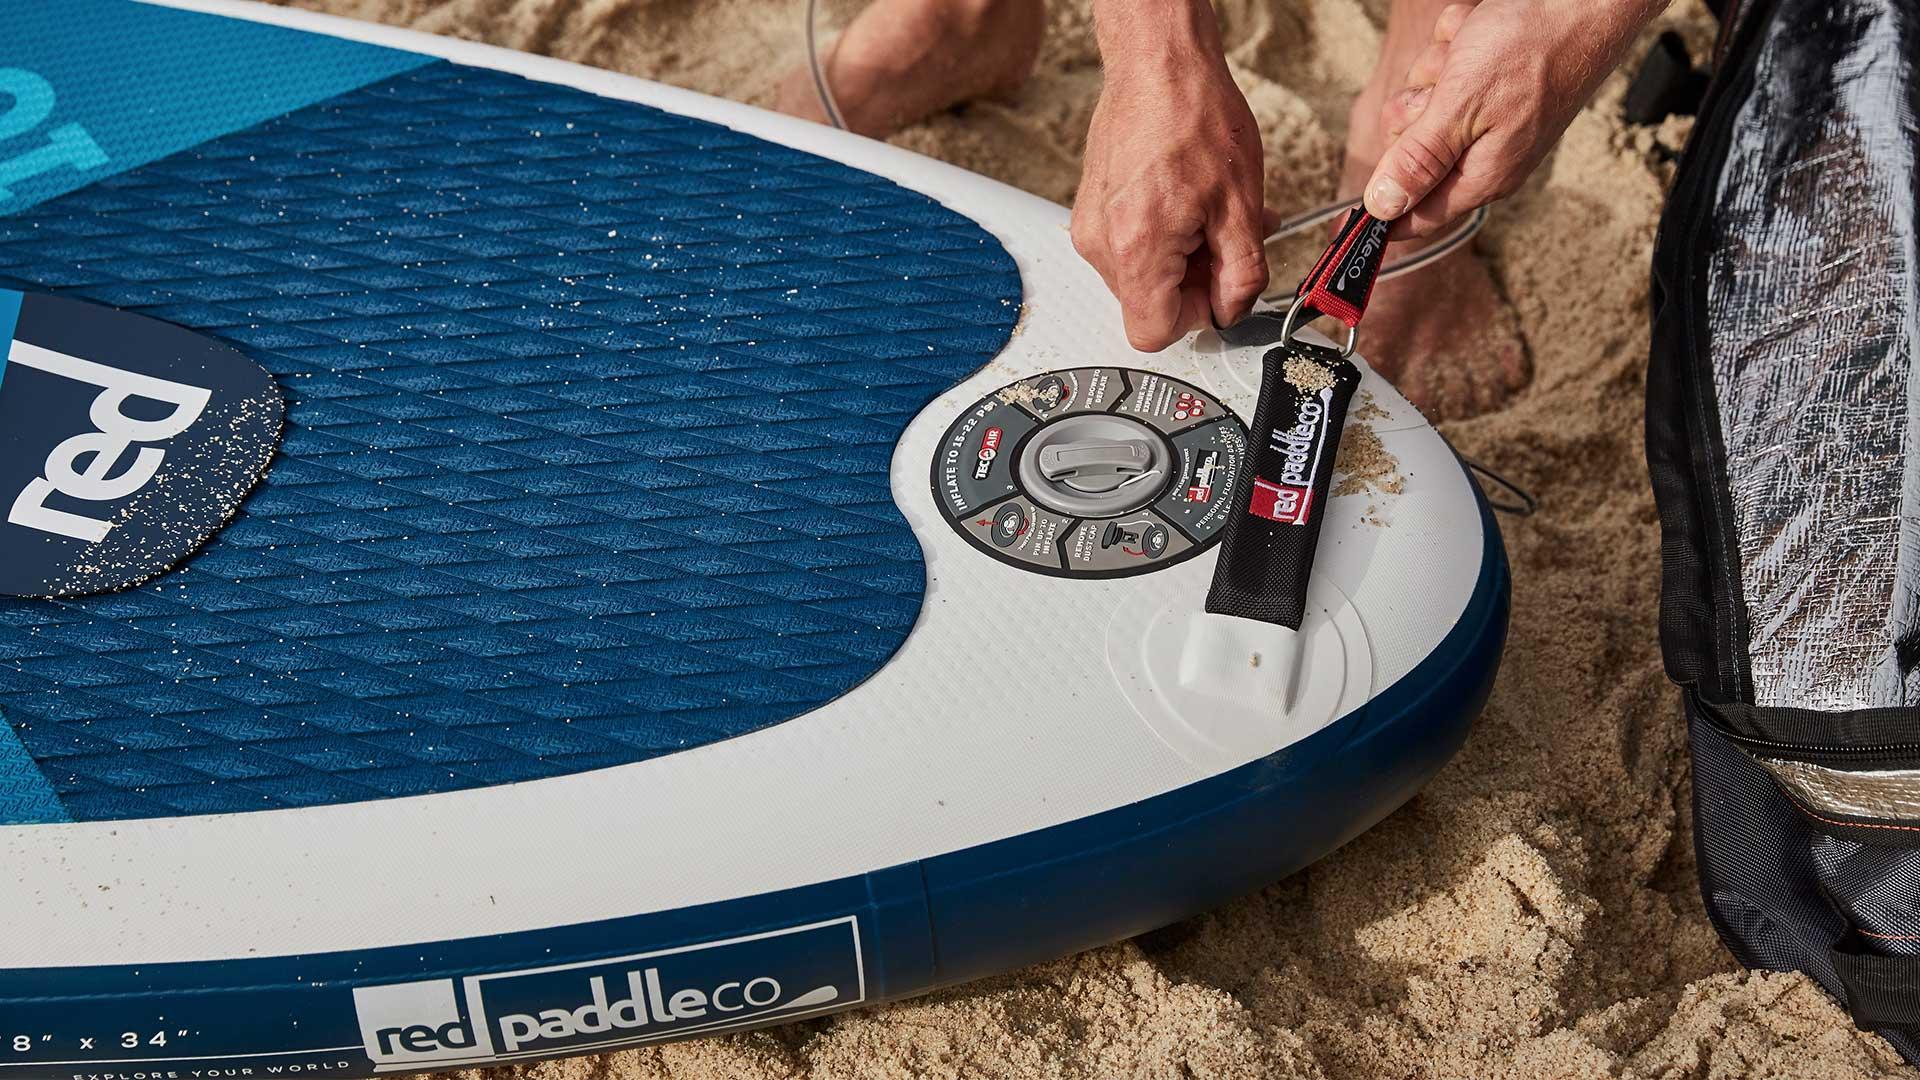 redpaddleco-108-ride-msl-inflatable-paddle-board-desktop-gallery-valve